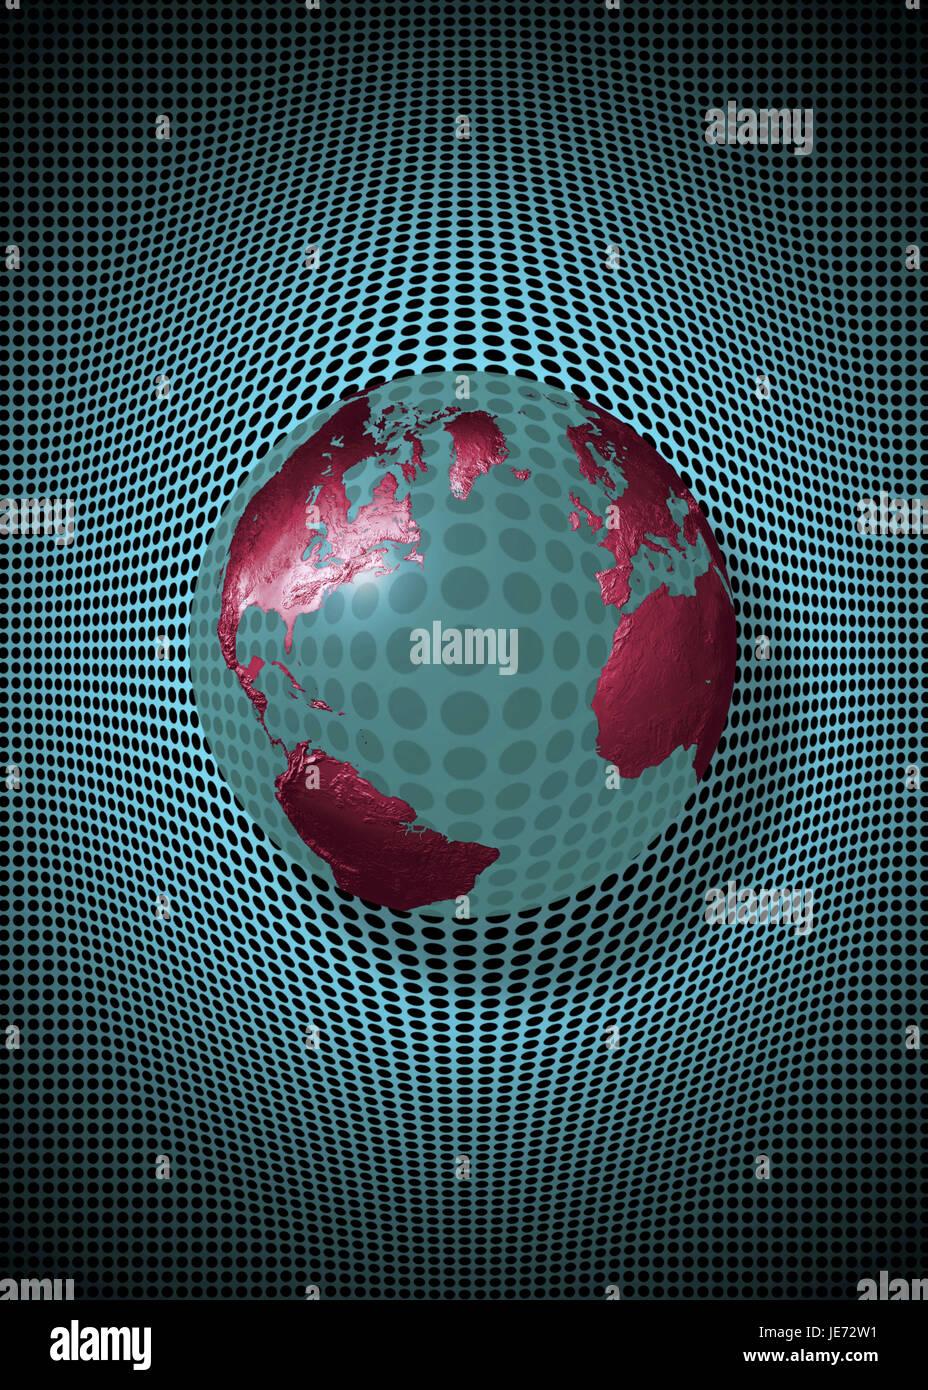 Globe, transparent, hole sample, - Stock Image